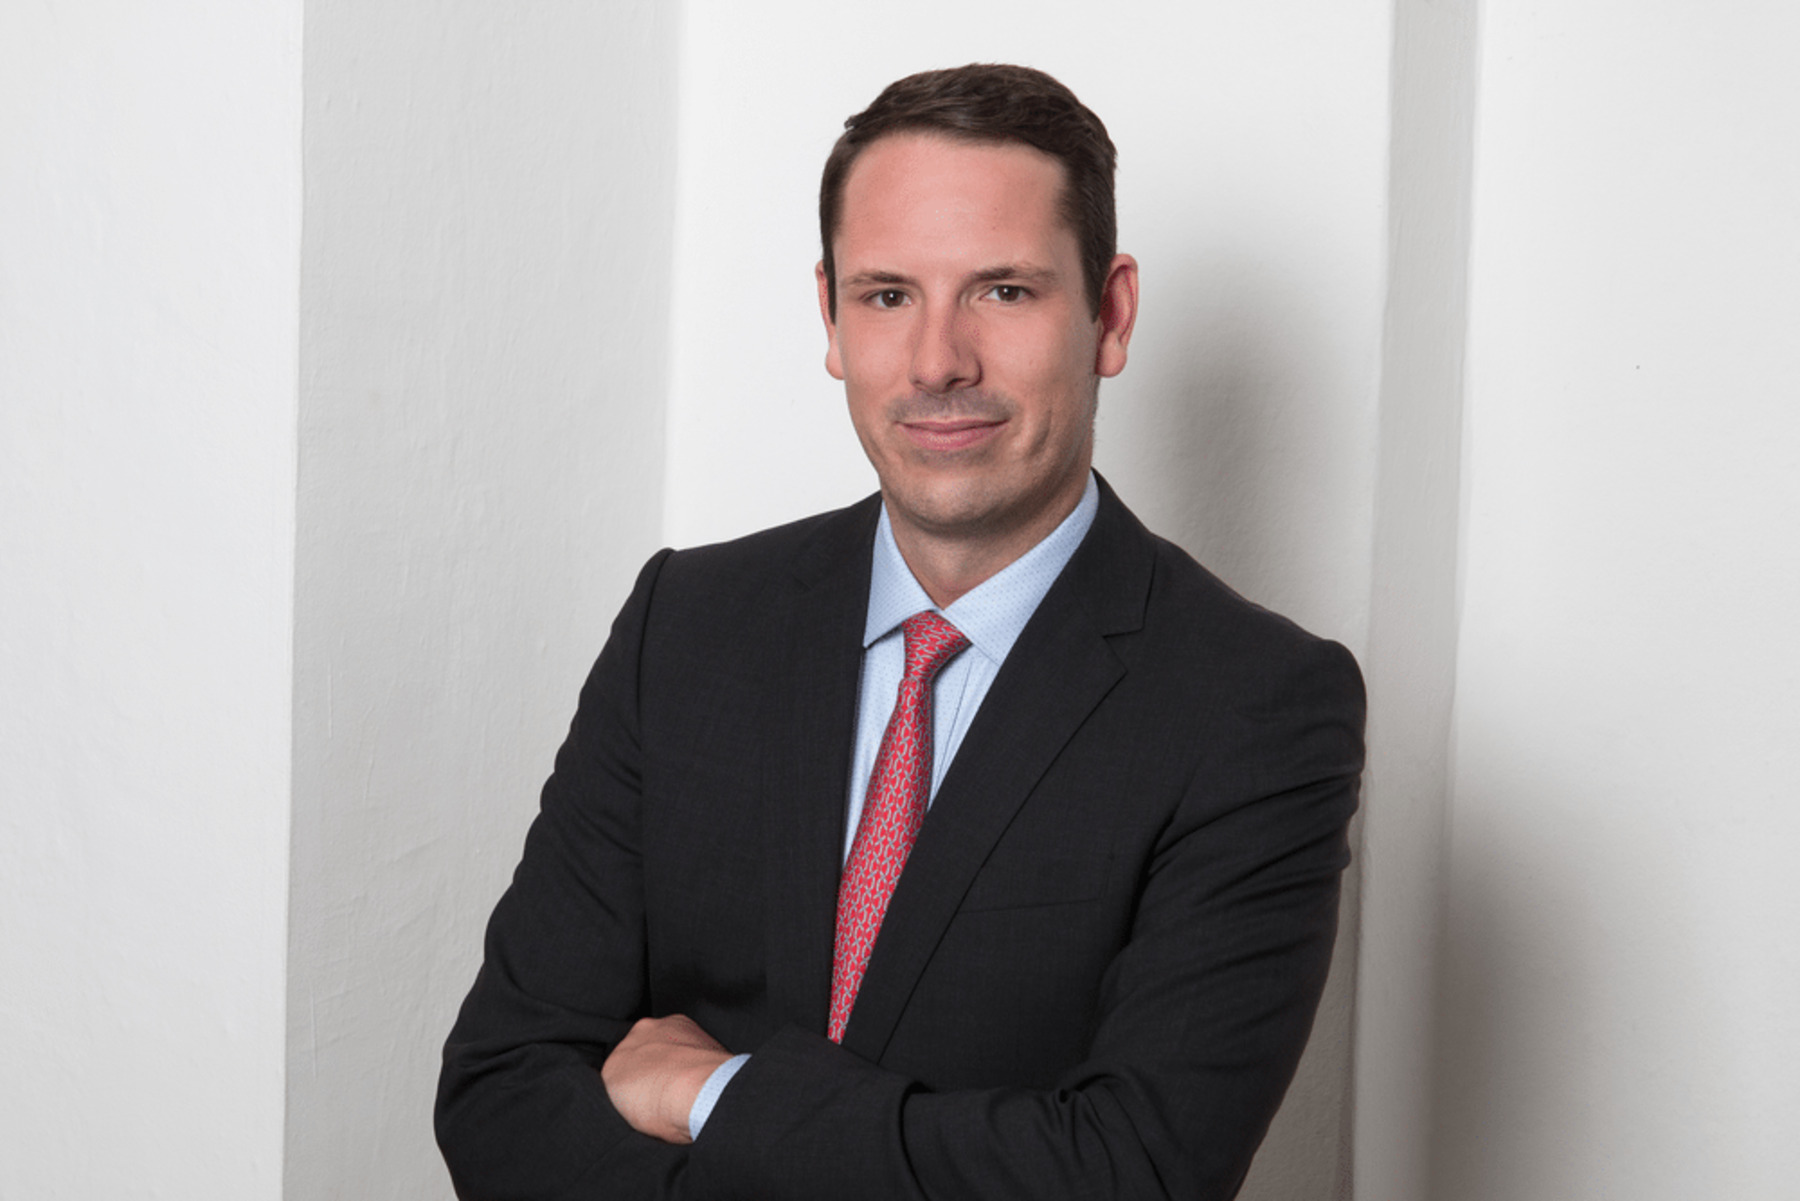 Linus Capital finanziert Projektentwicklung im Südwesten Berlins